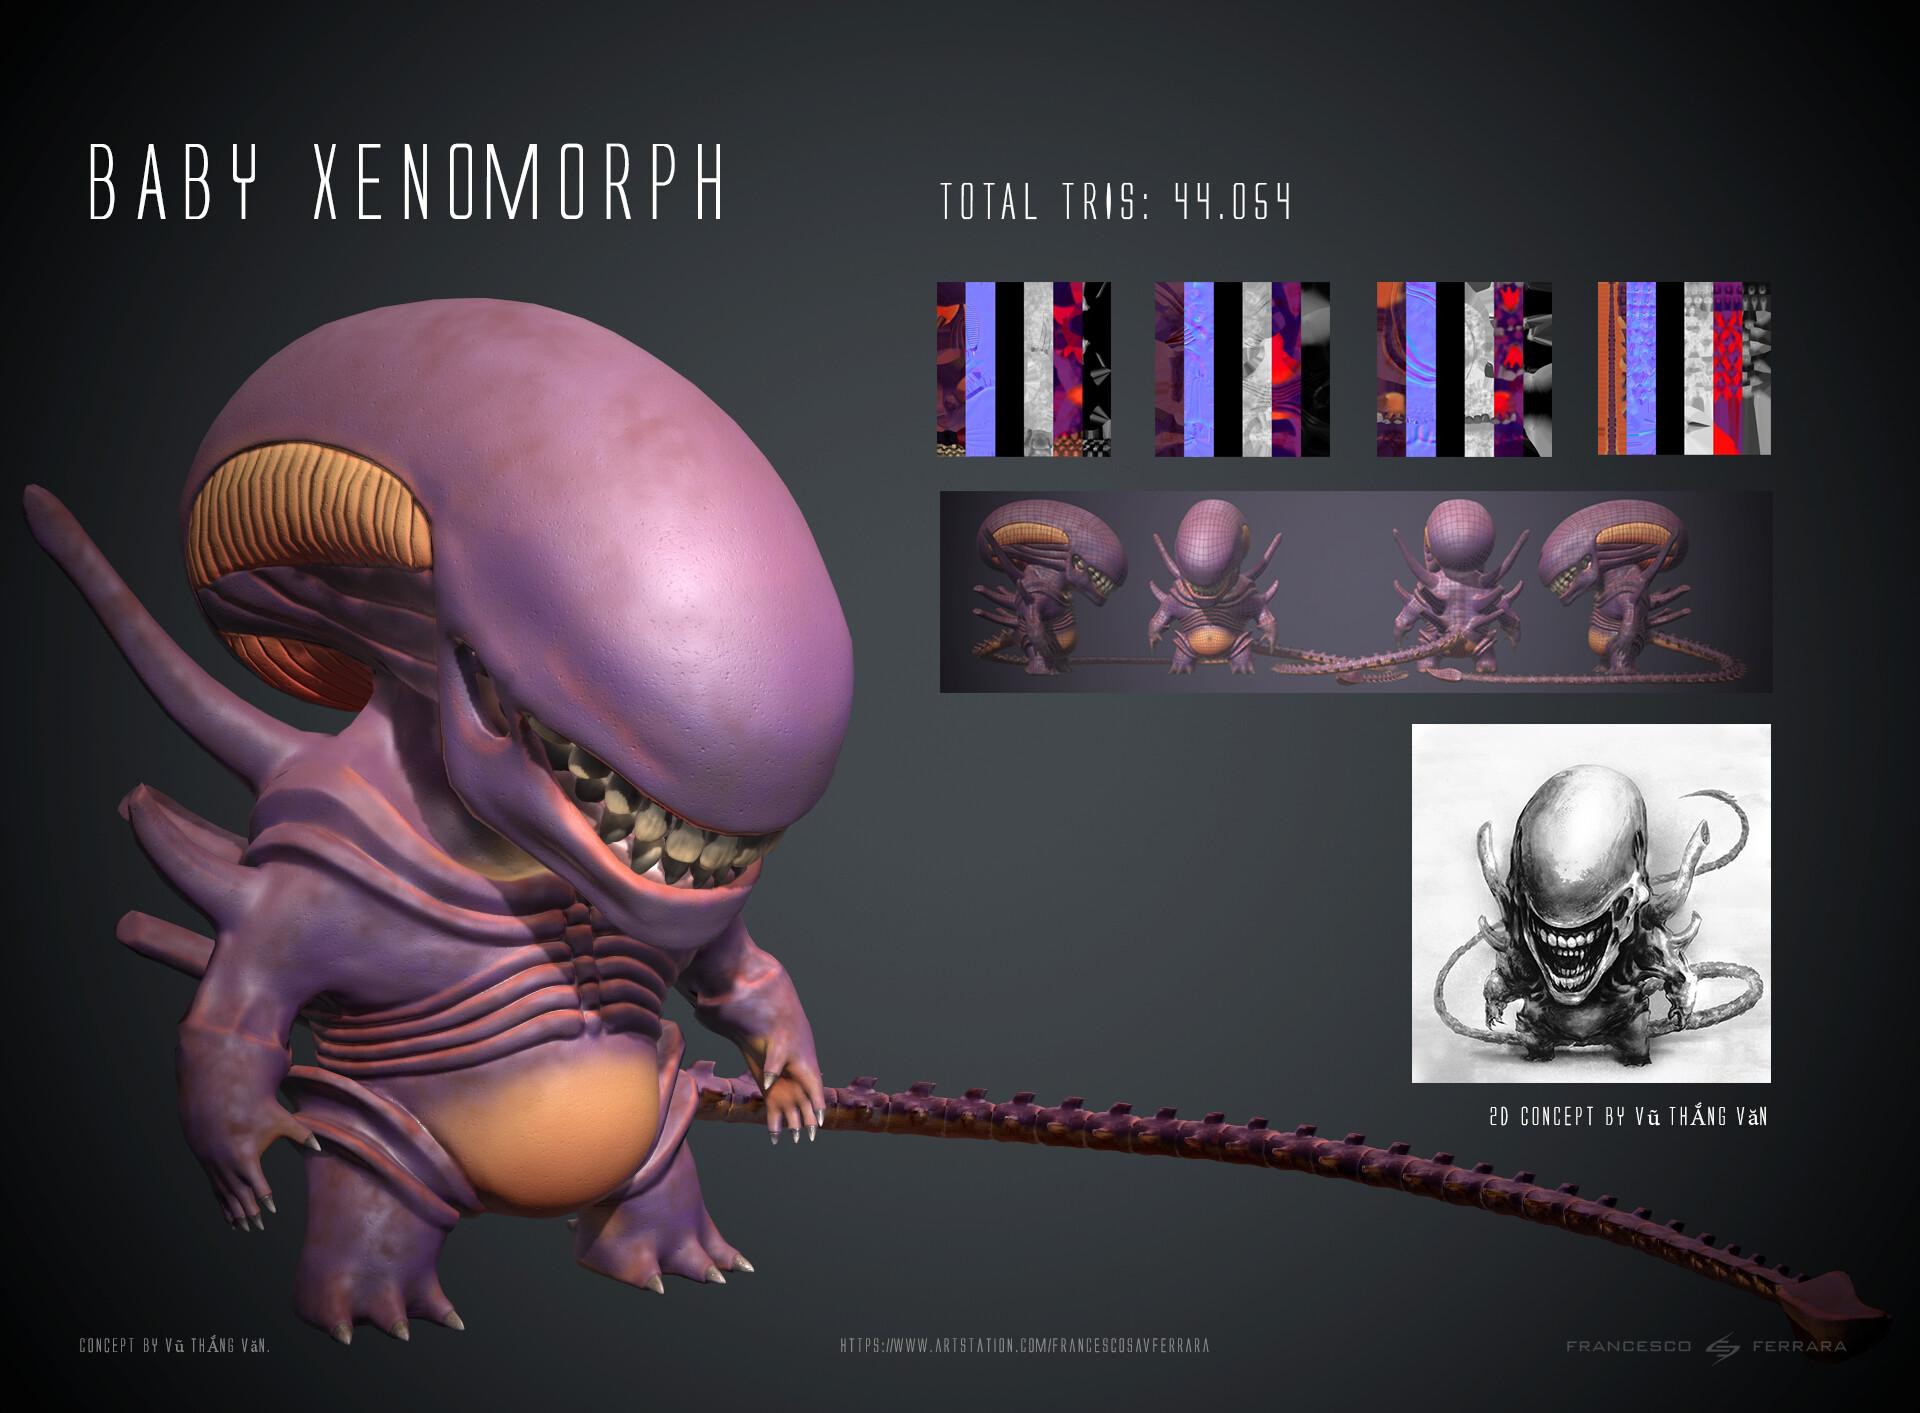 ArtStation - Baby Xenomorph - Realtime Character, Francesco